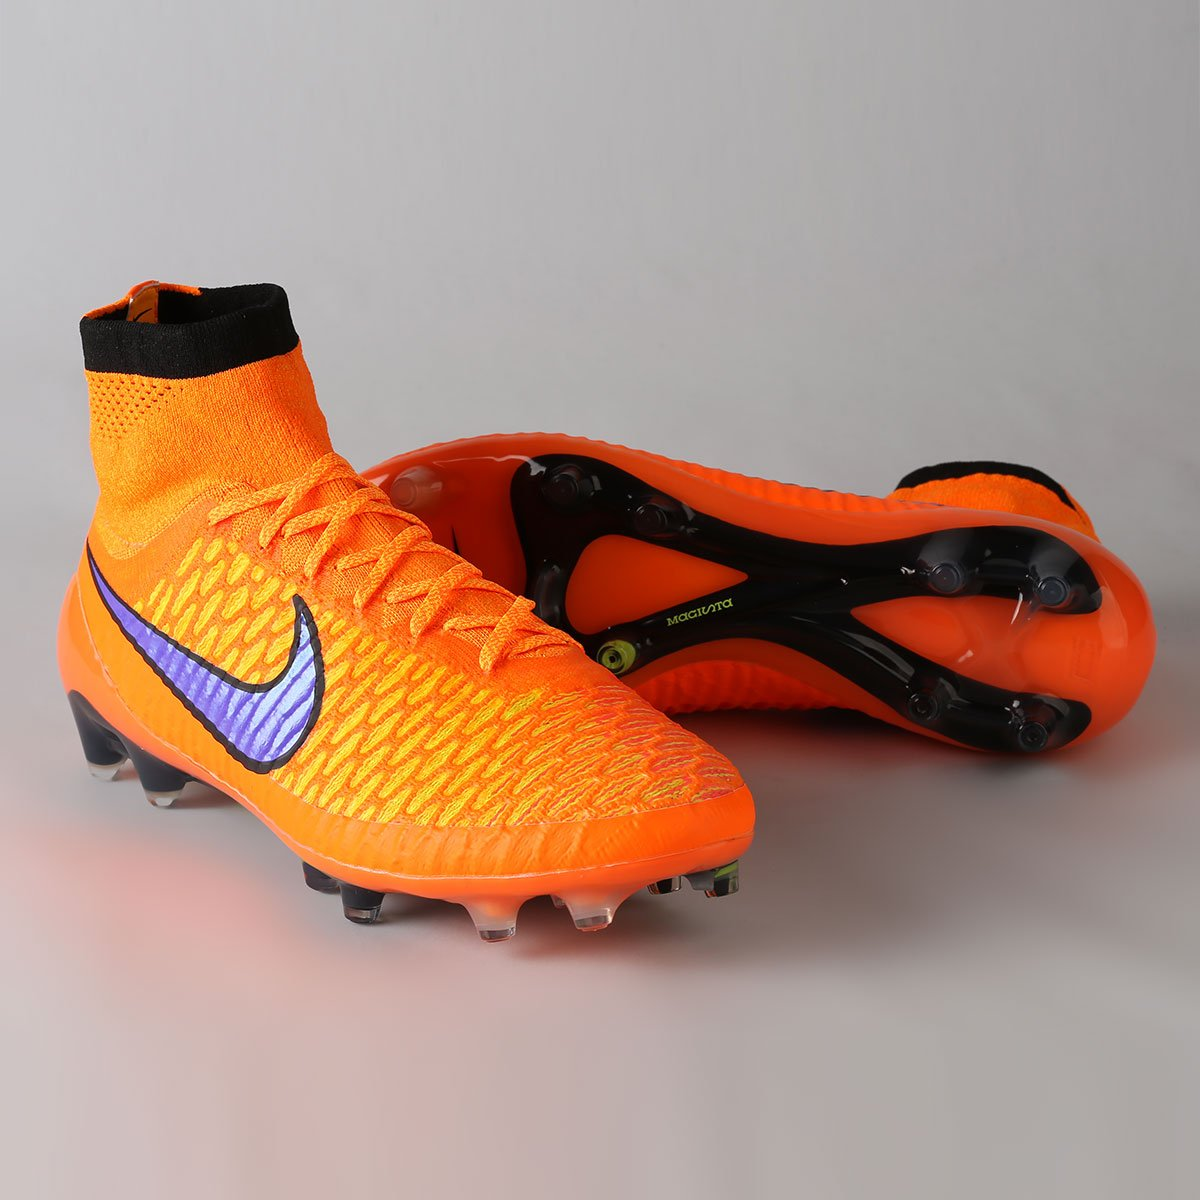 9aac27beab242 Chuteira Nike Magista Obra FG Campo - Compre Agora